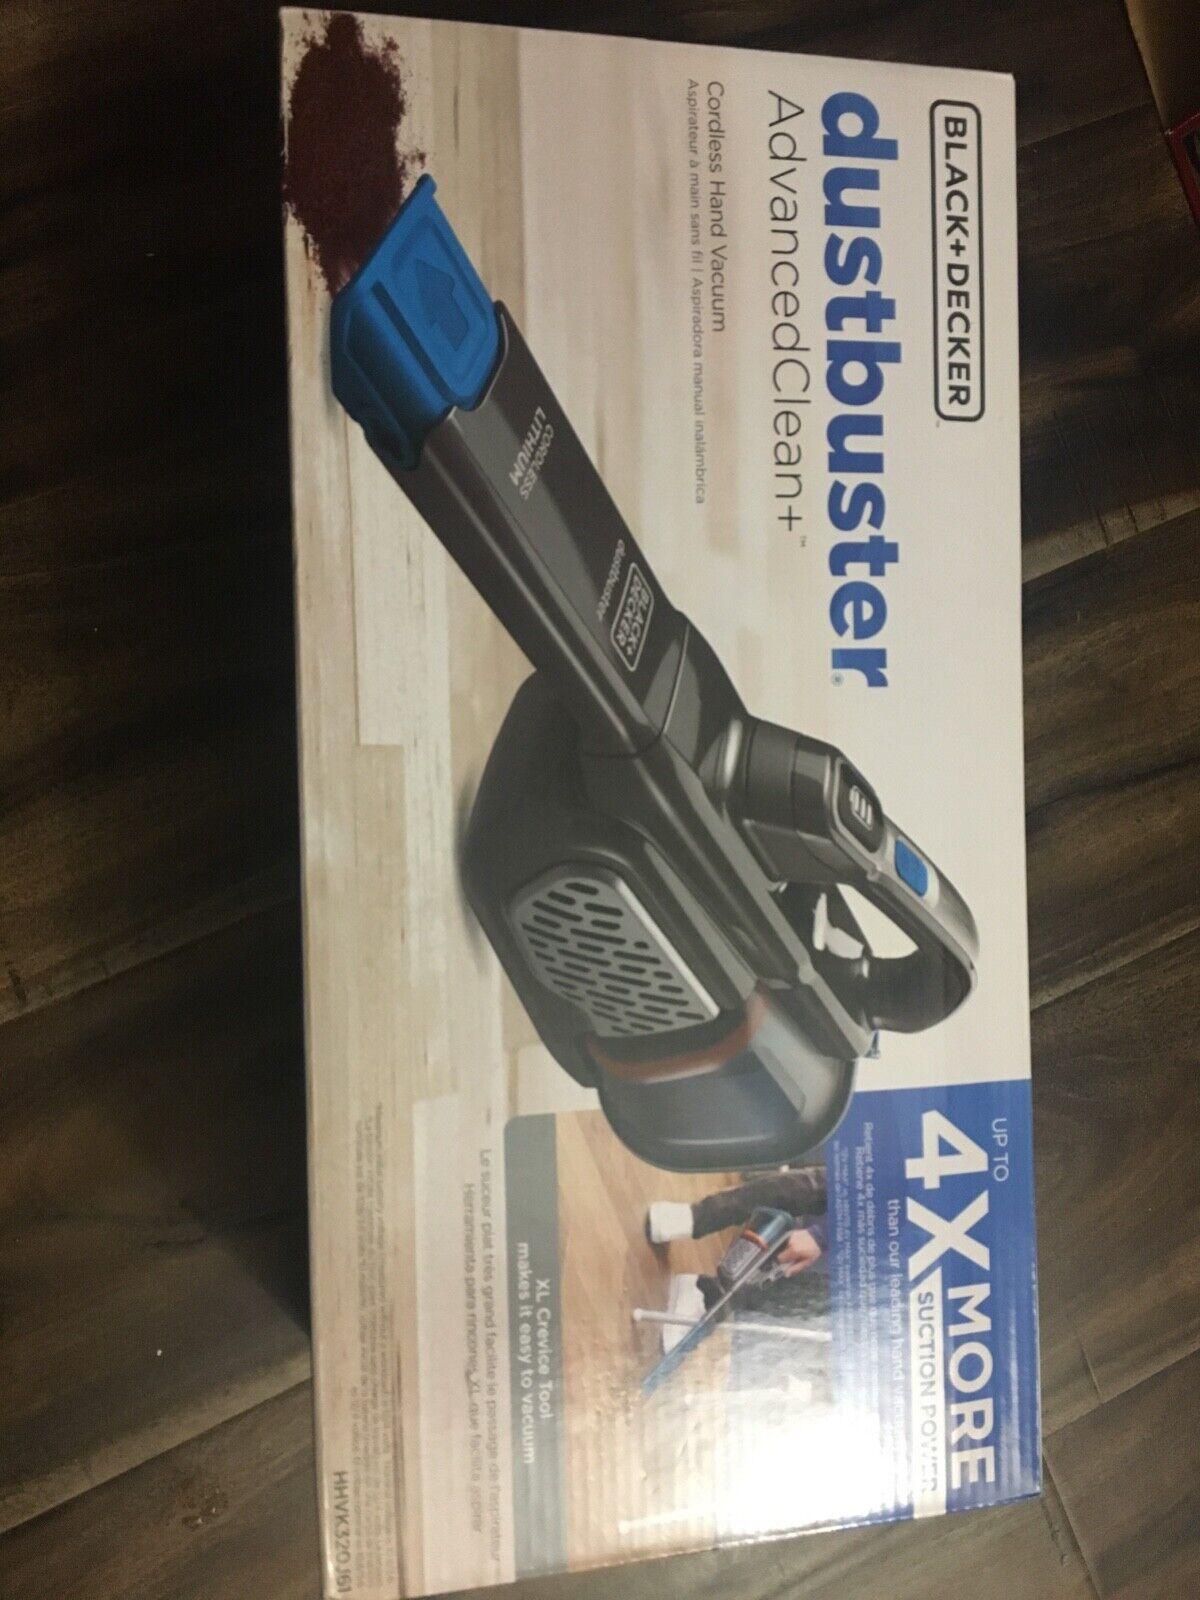 BLACK+DECKER HHVK320J61 Dustbuster AdvancedClean+ Hand Vacuu